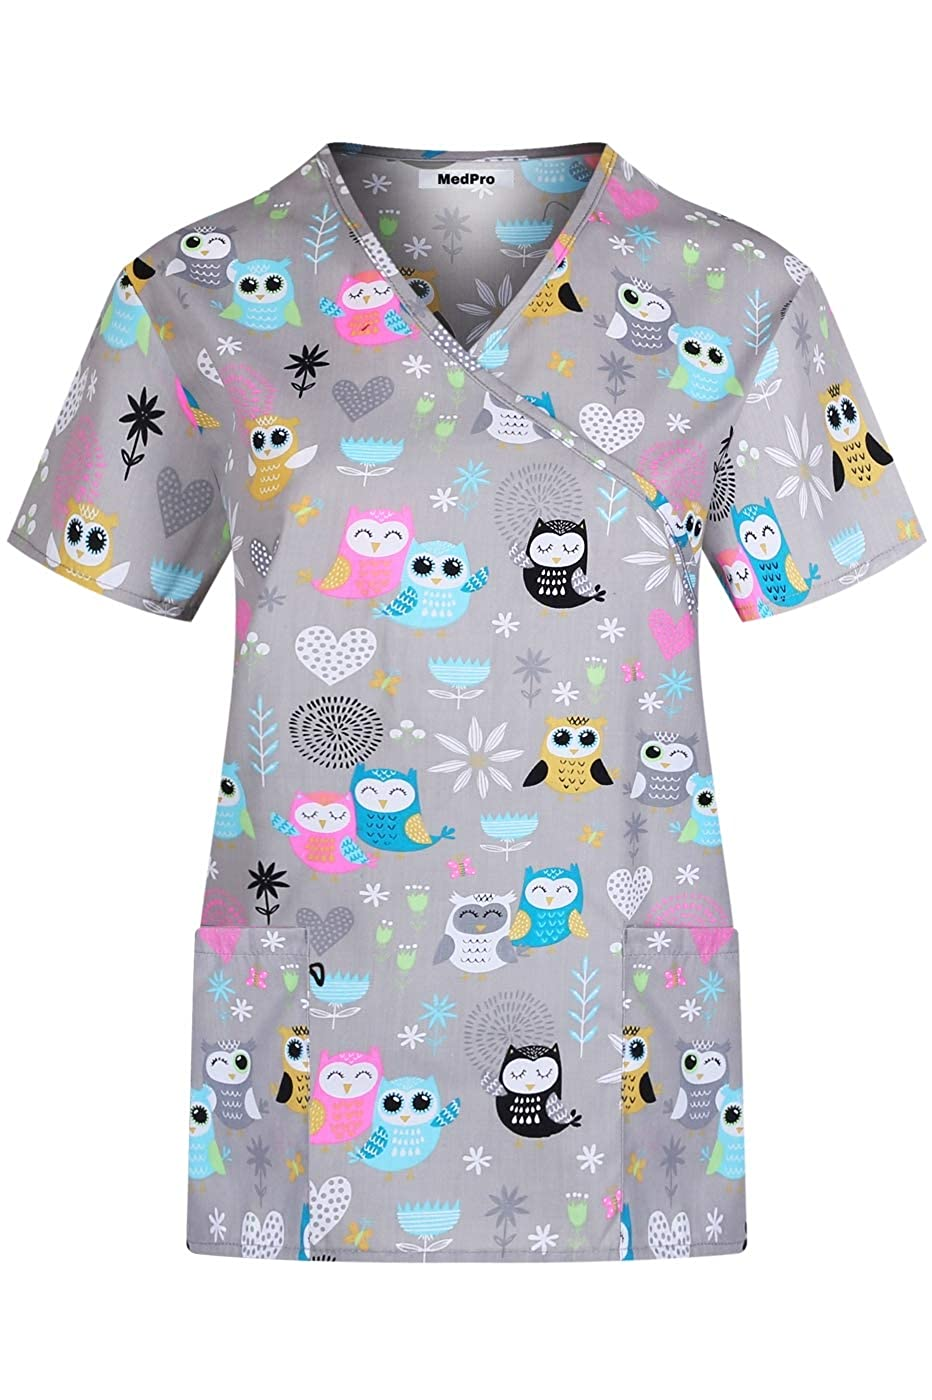 13932b5b775 Amazon.com: MedPro Women's Printed Medical Scrub Set Mock Wrap Top and Pants:  Clothing